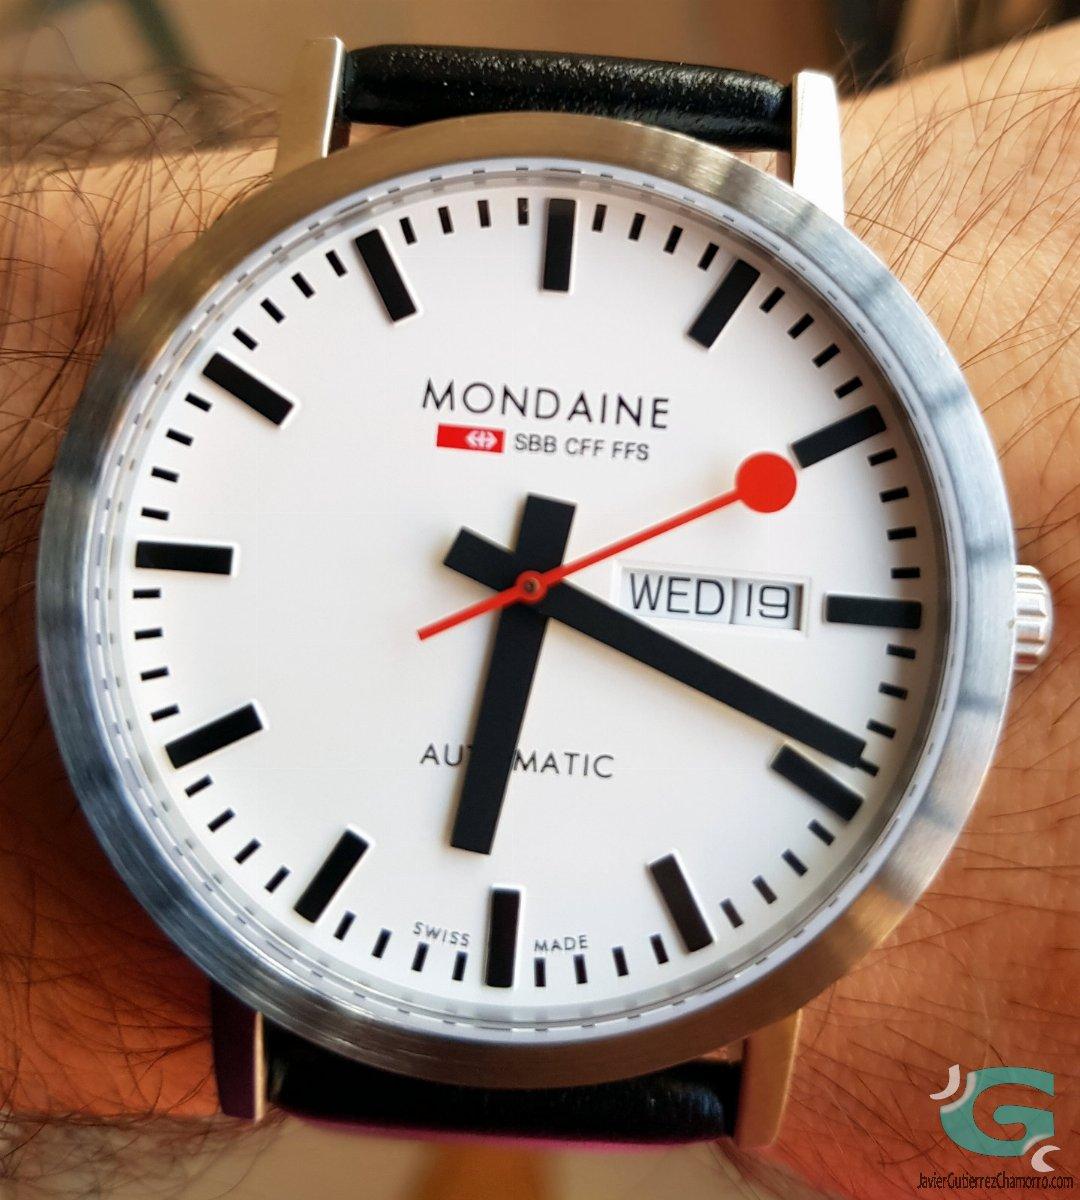 Mondaine SBB Classic Automatic